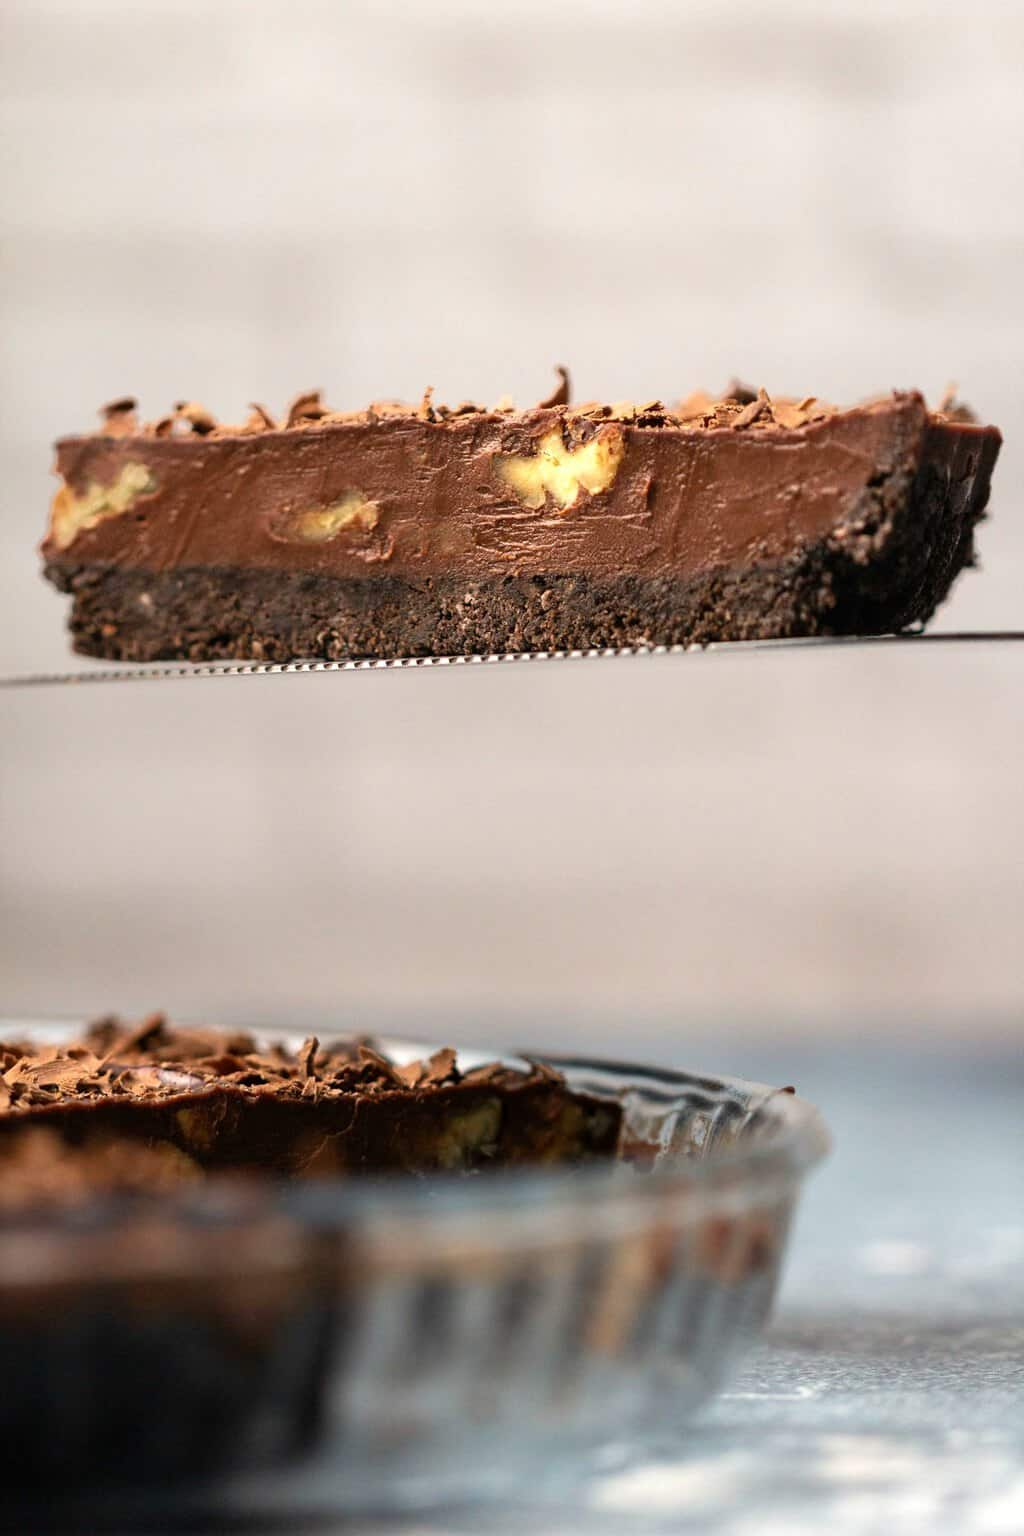 A slice of vegan chocolate tart on a cake lifter.